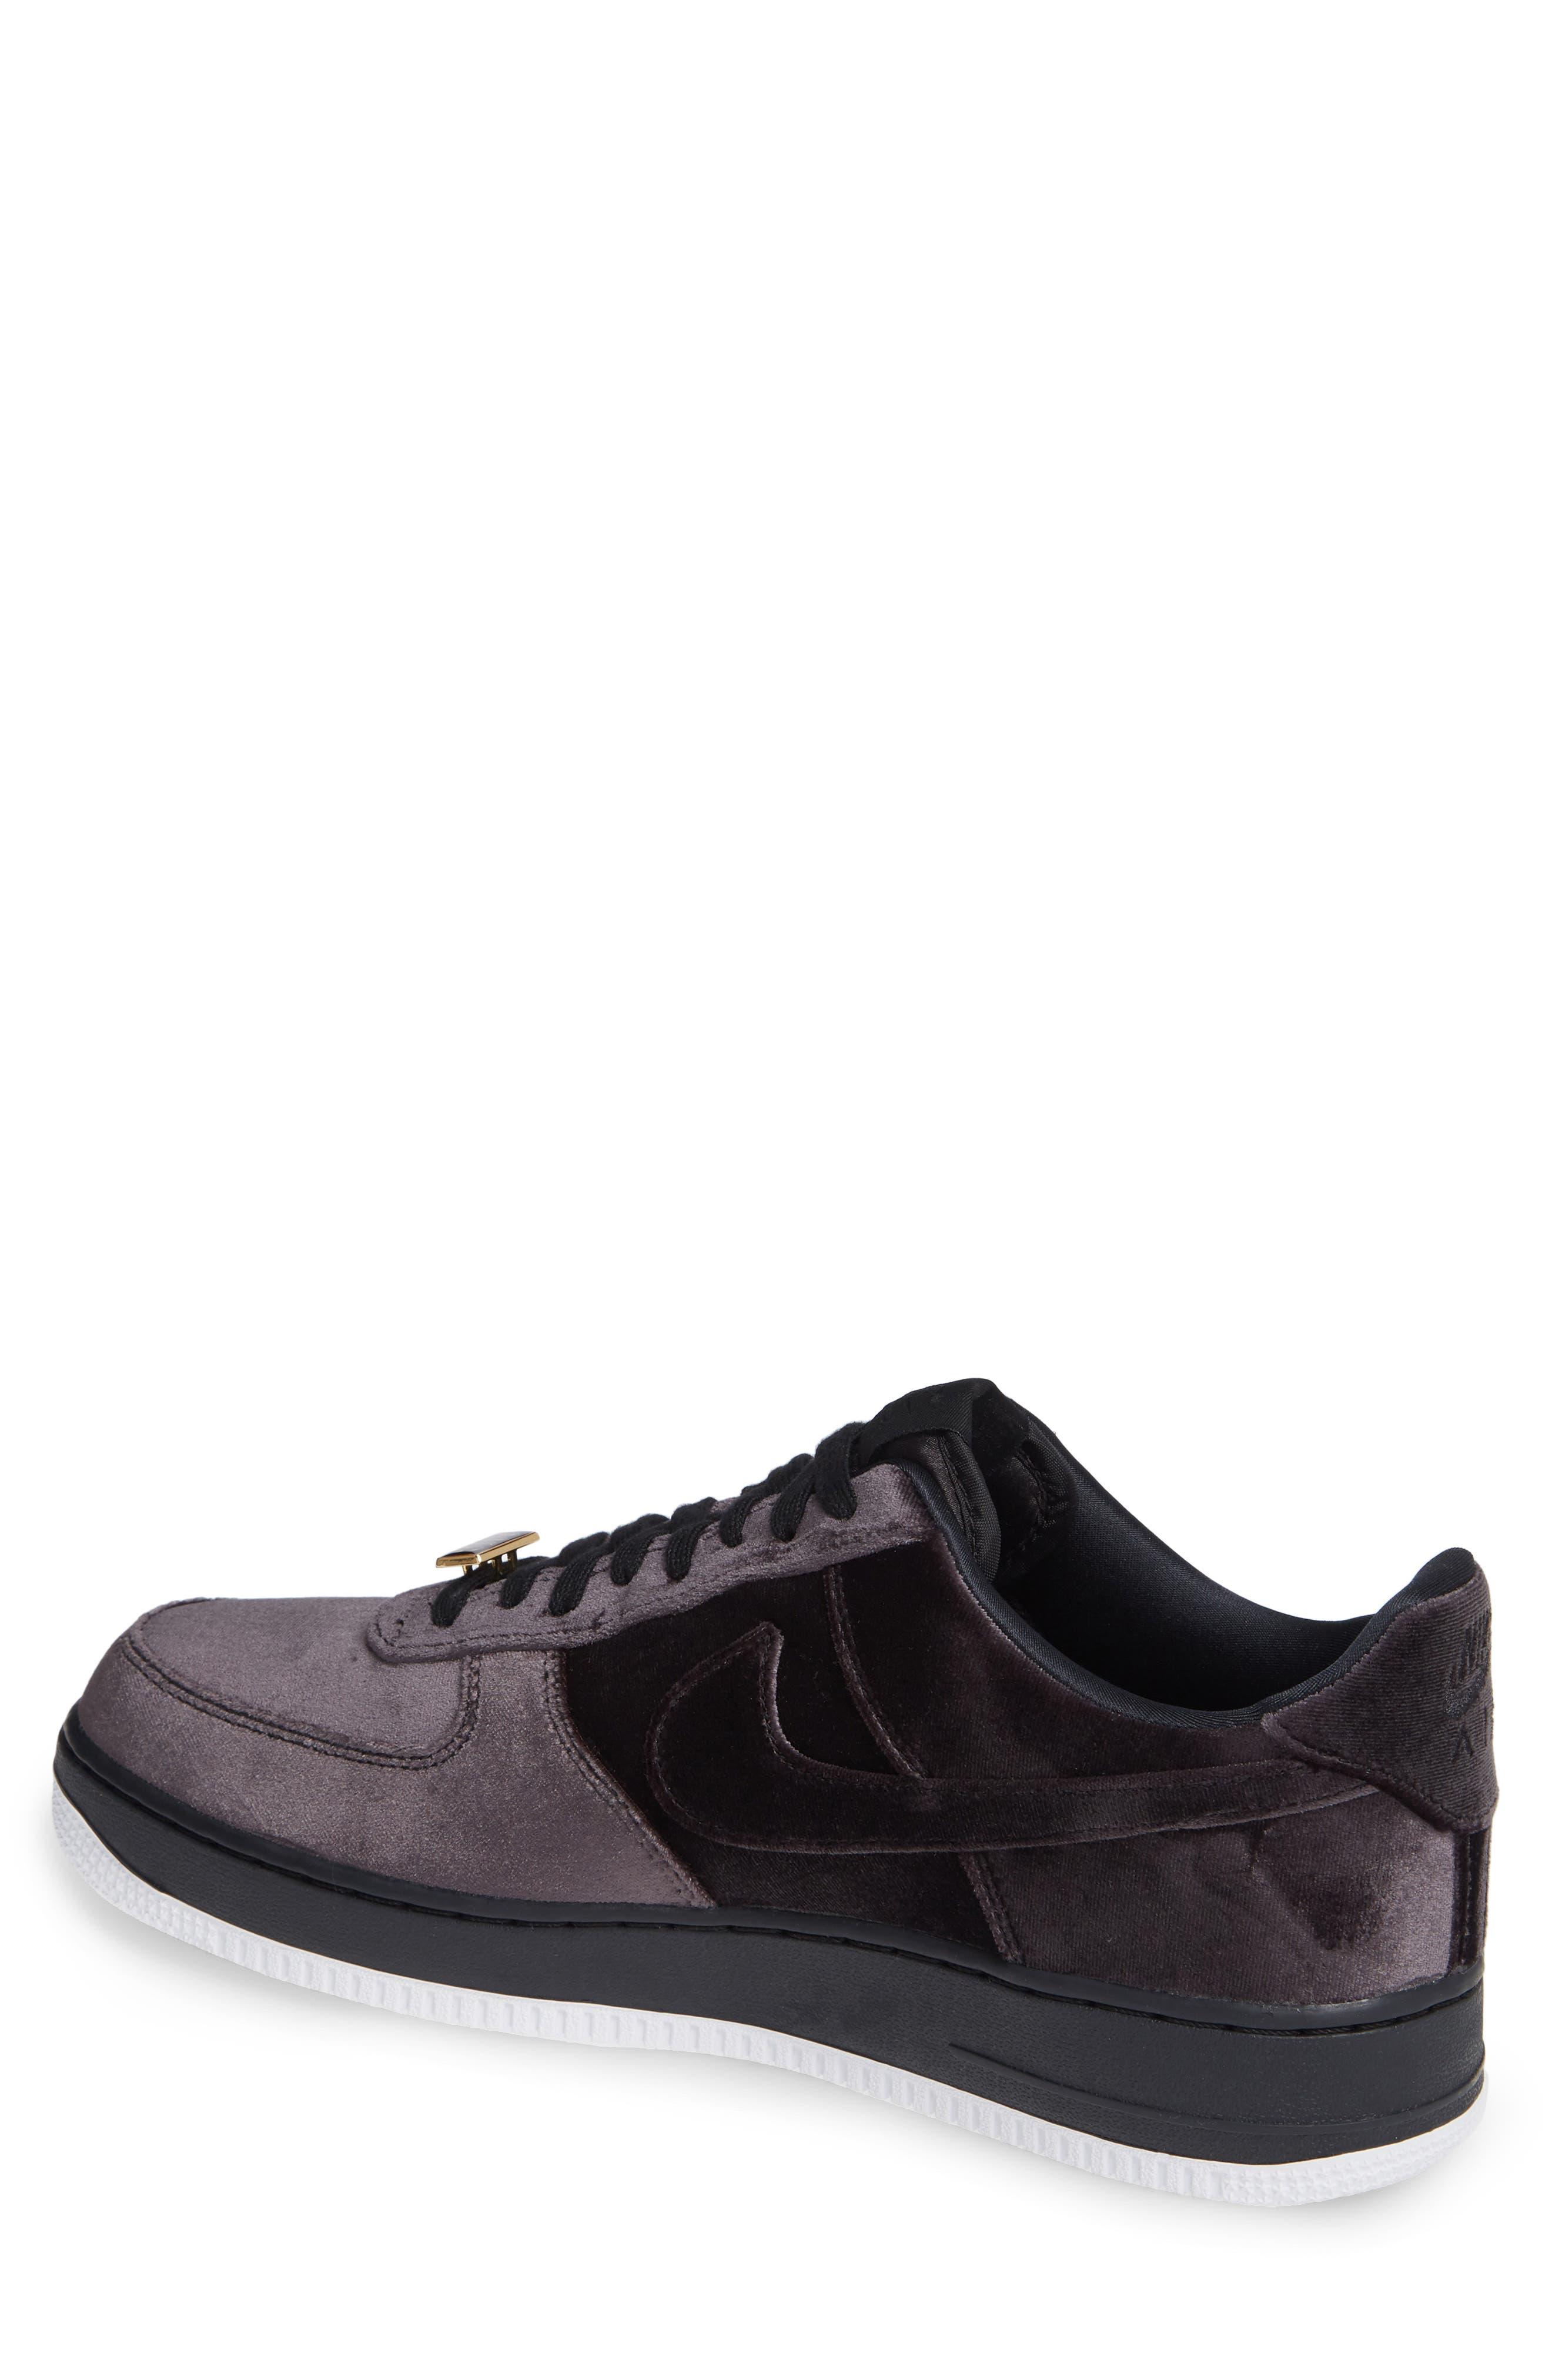 Air Force 1 '07 QS Sneaker,                             Alternate thumbnail 2, color,                             BLACK/ BLACK/ WHITE